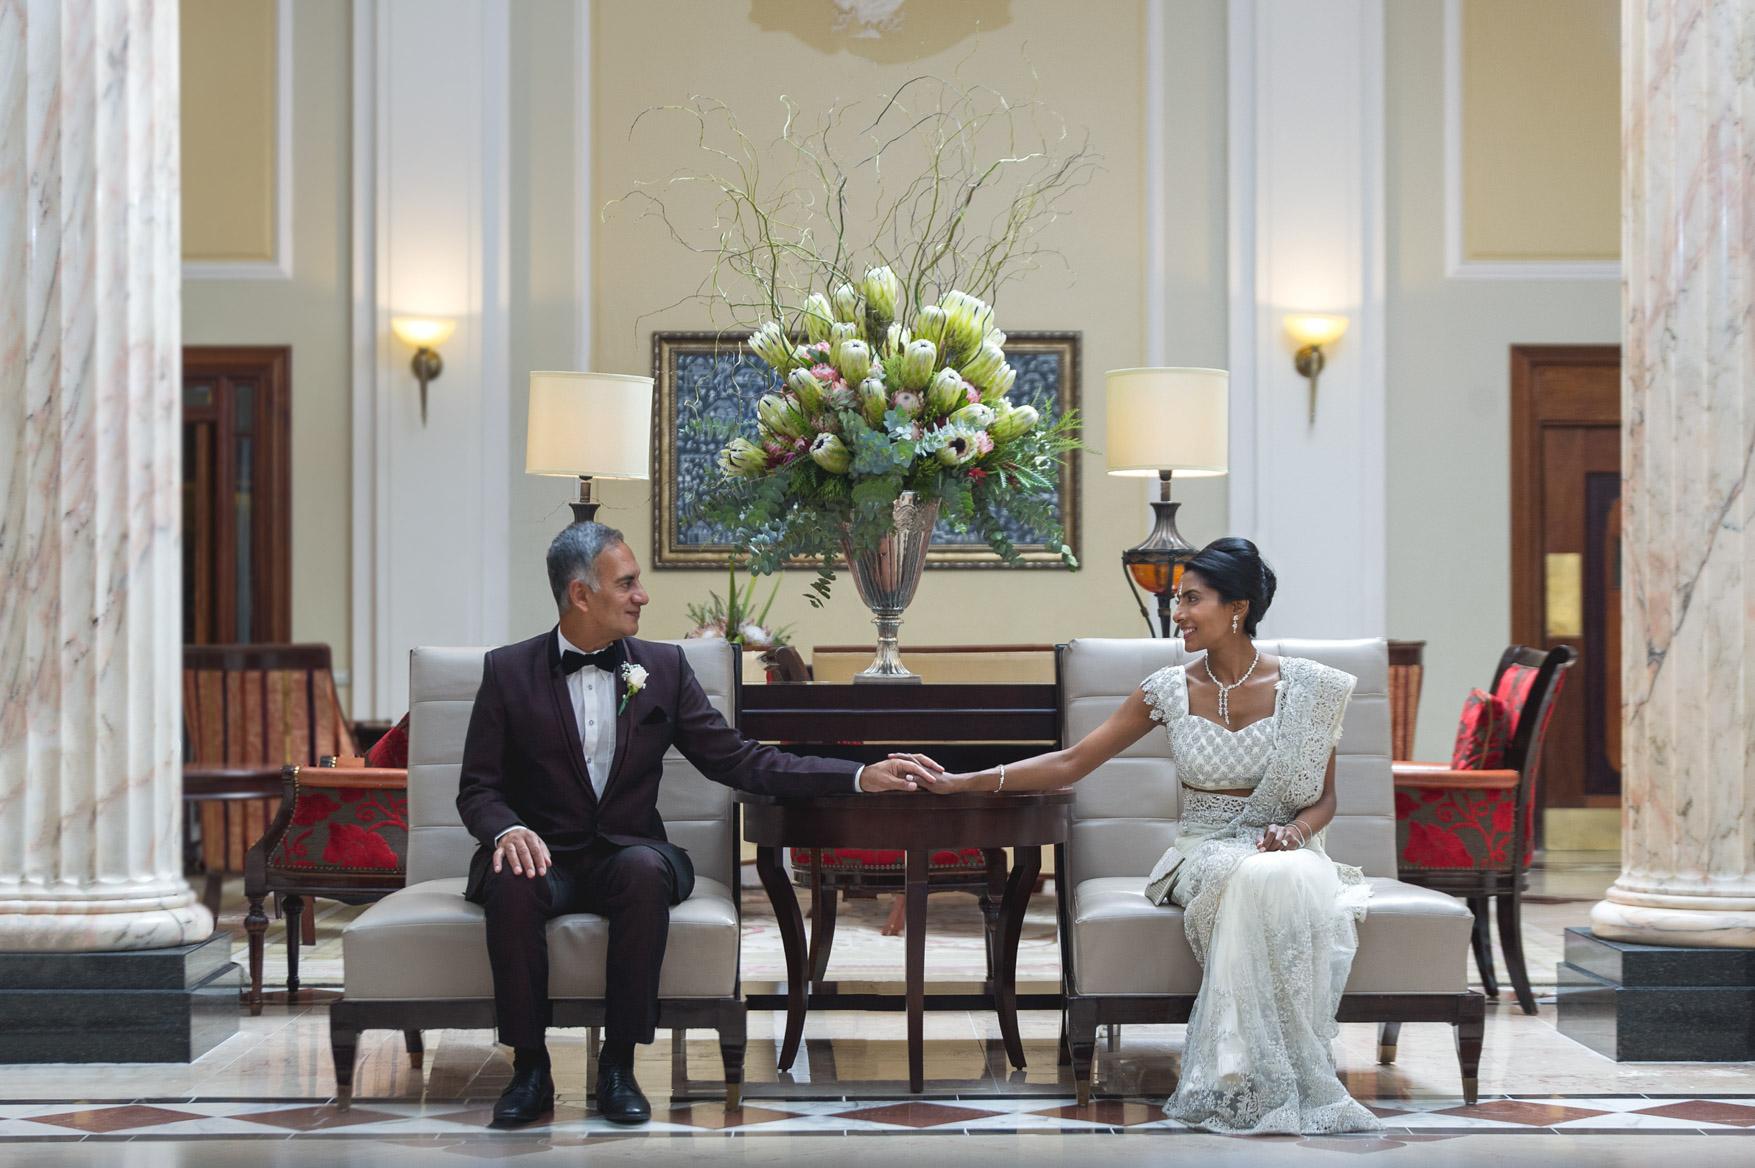 Bridesmaid-SA-Wedding-pictures-by-John-henry-Bartlett-001.jpg